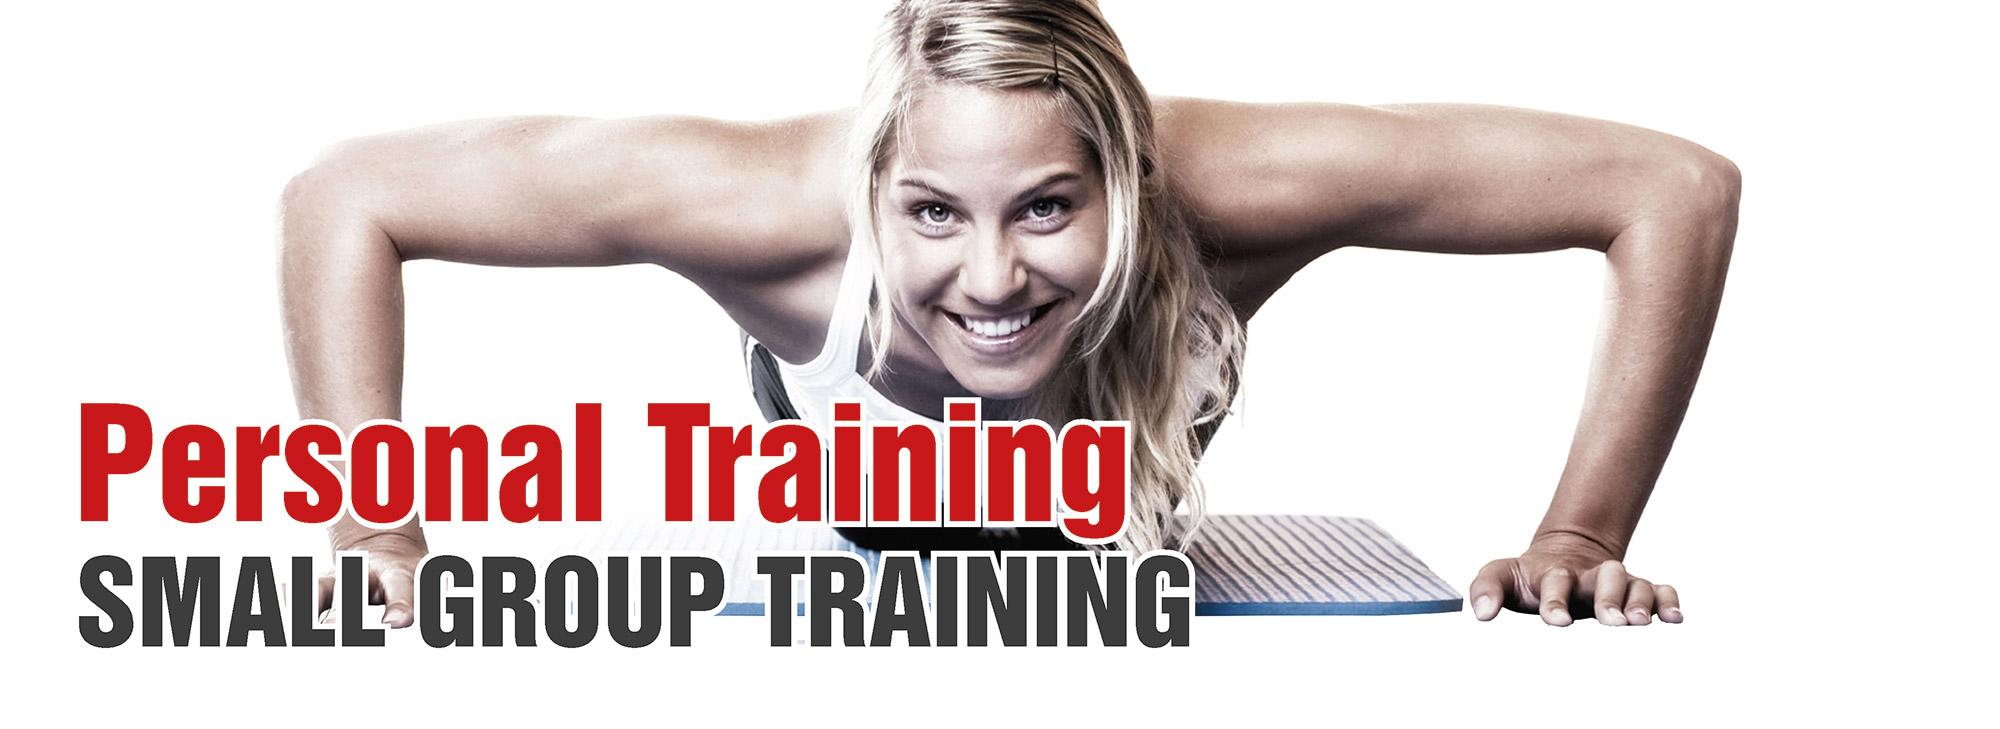 pt en small group training